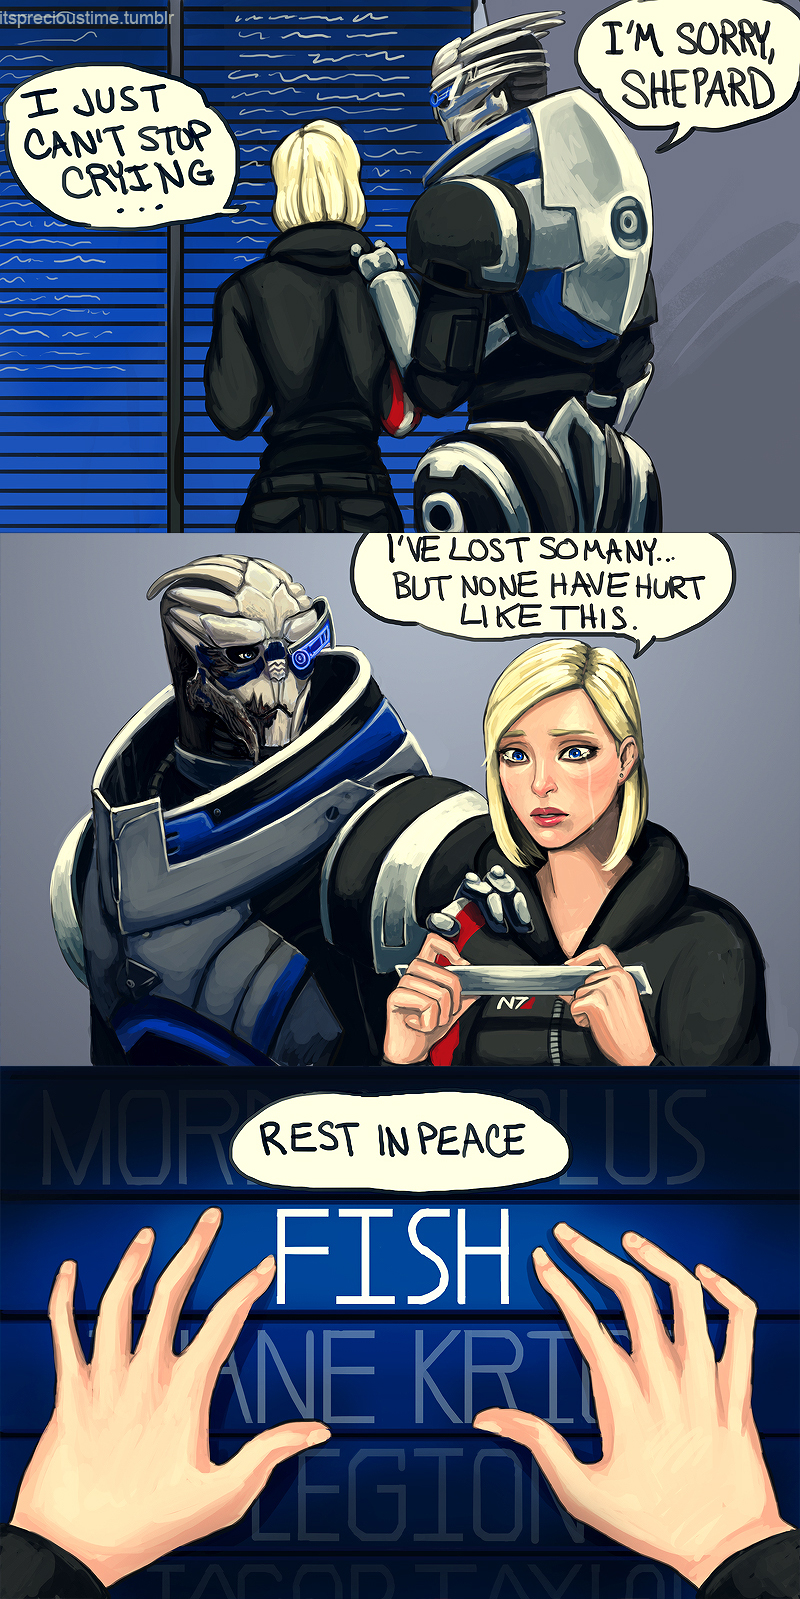 Shepard's Tragedy by itsprecioustime